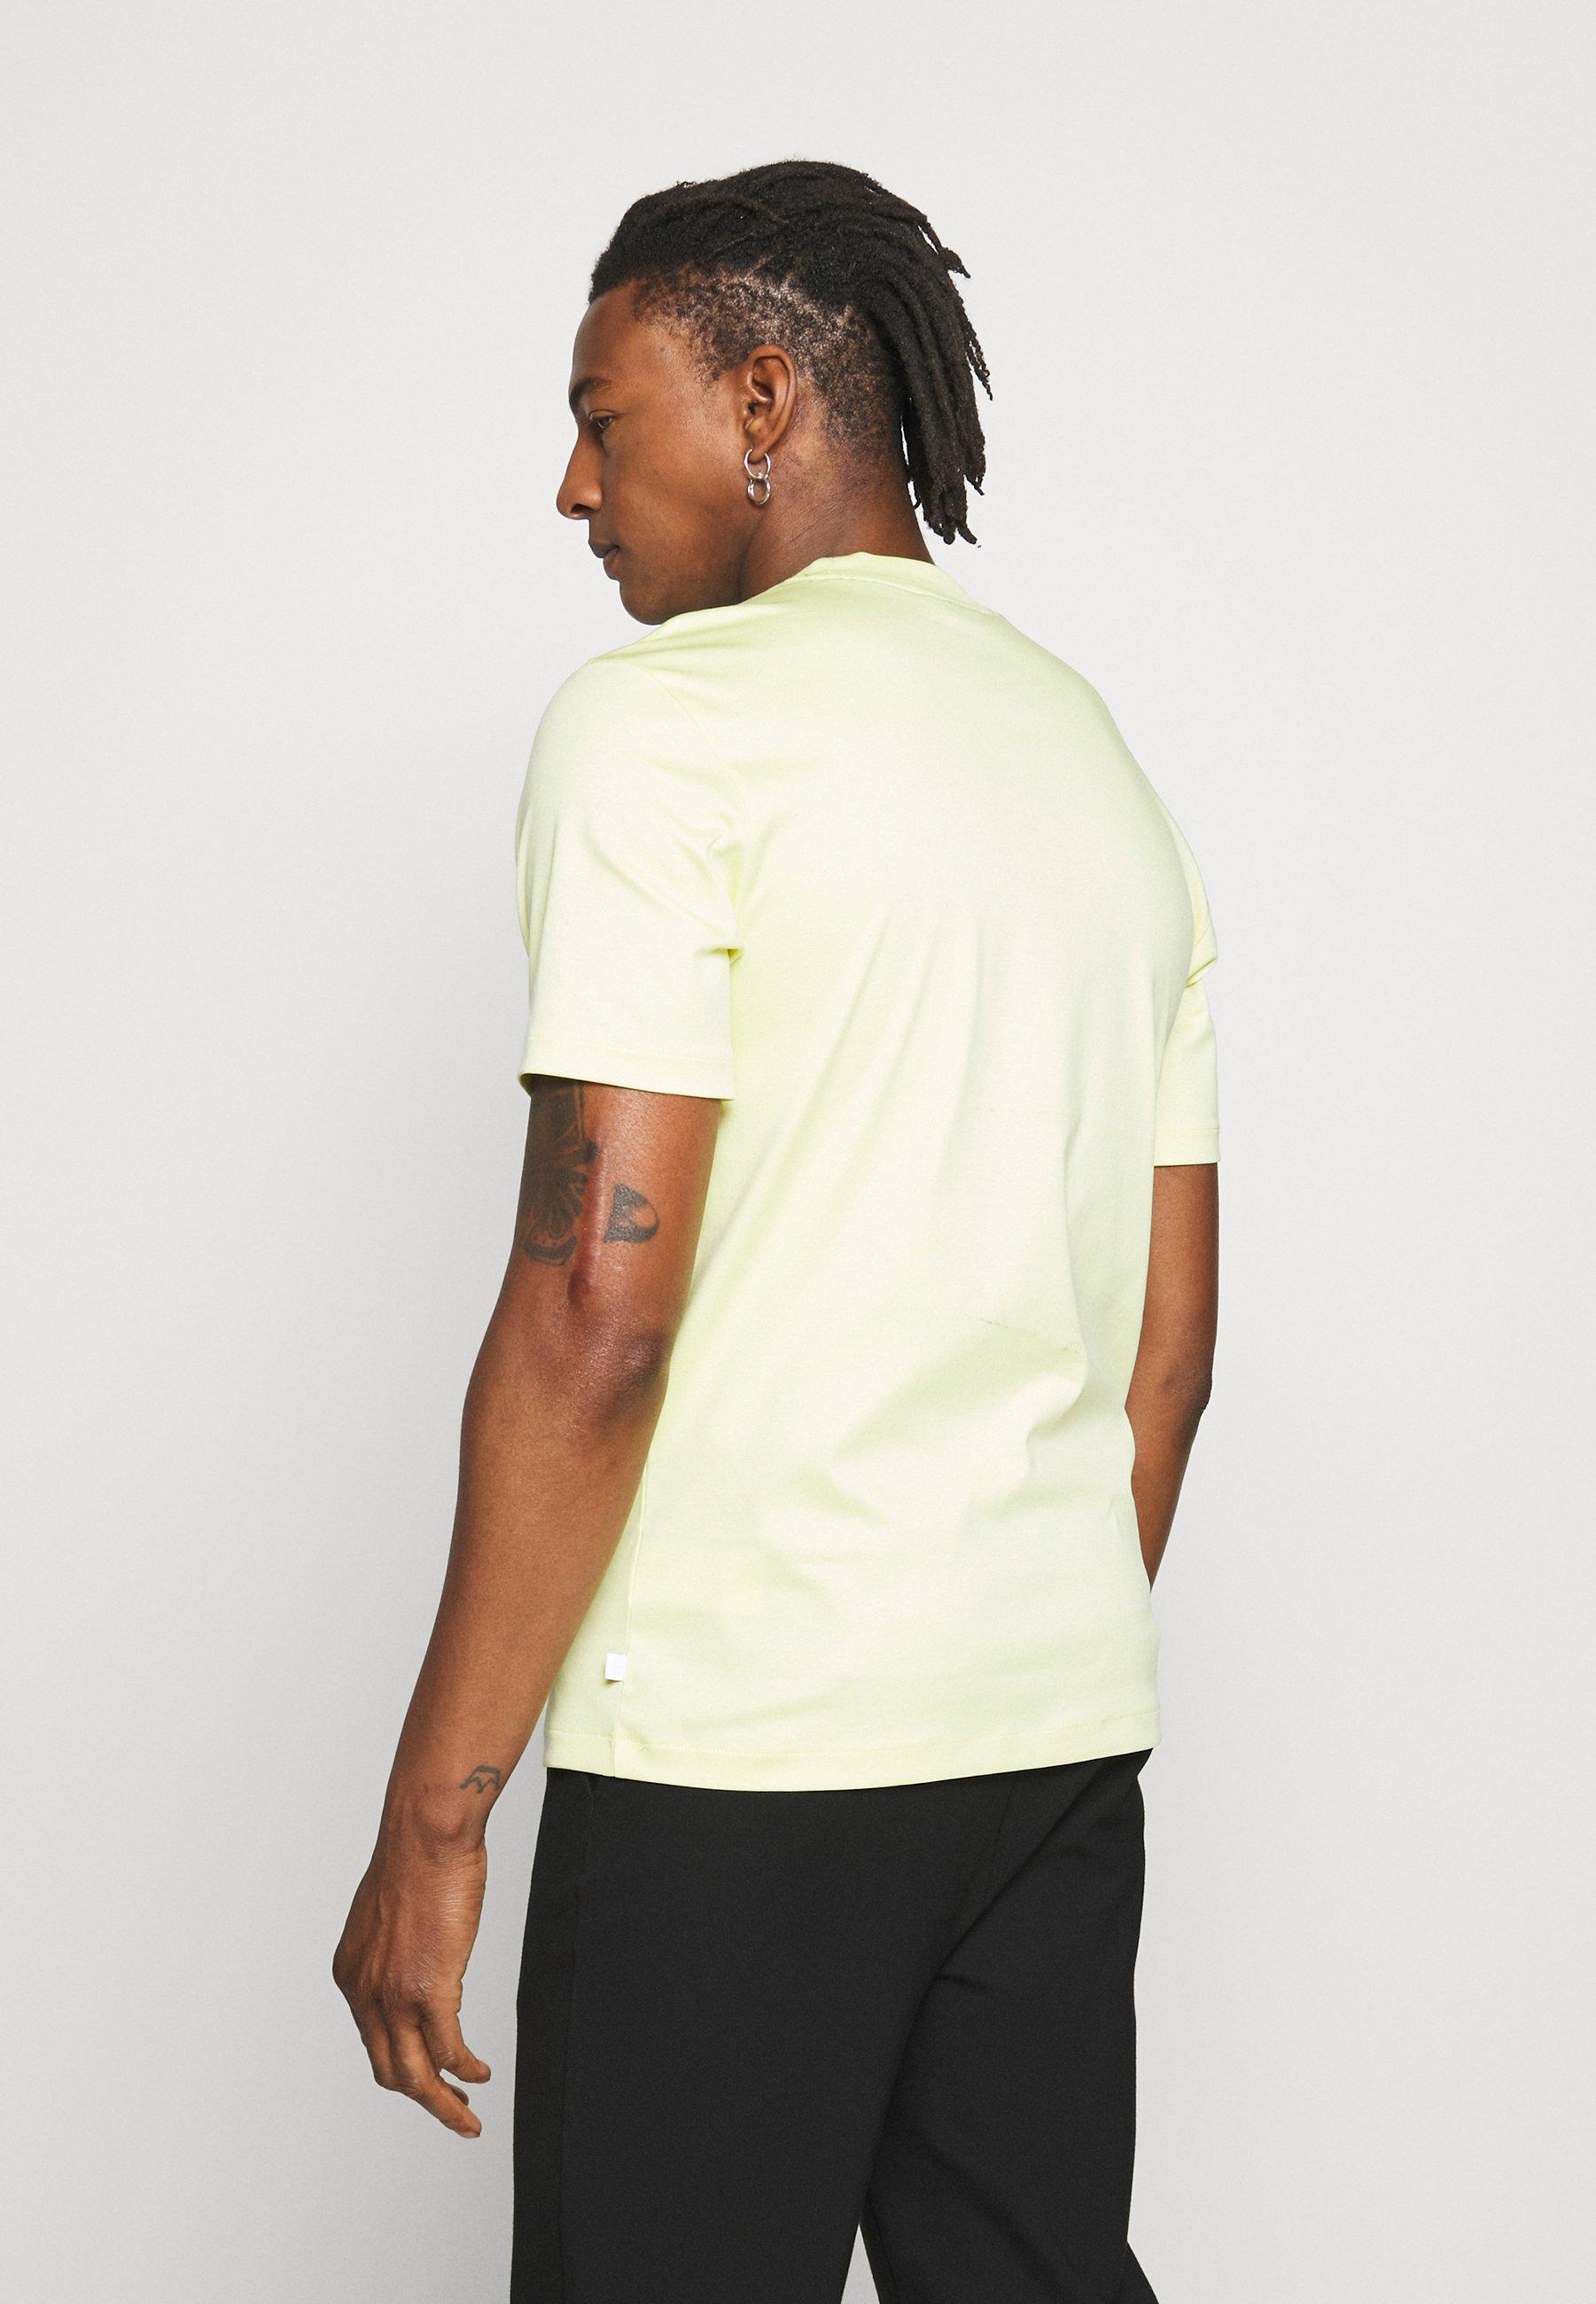 J.lindeberg Ace Smooth - T-shirt Basique Still Yellow i7uGlns